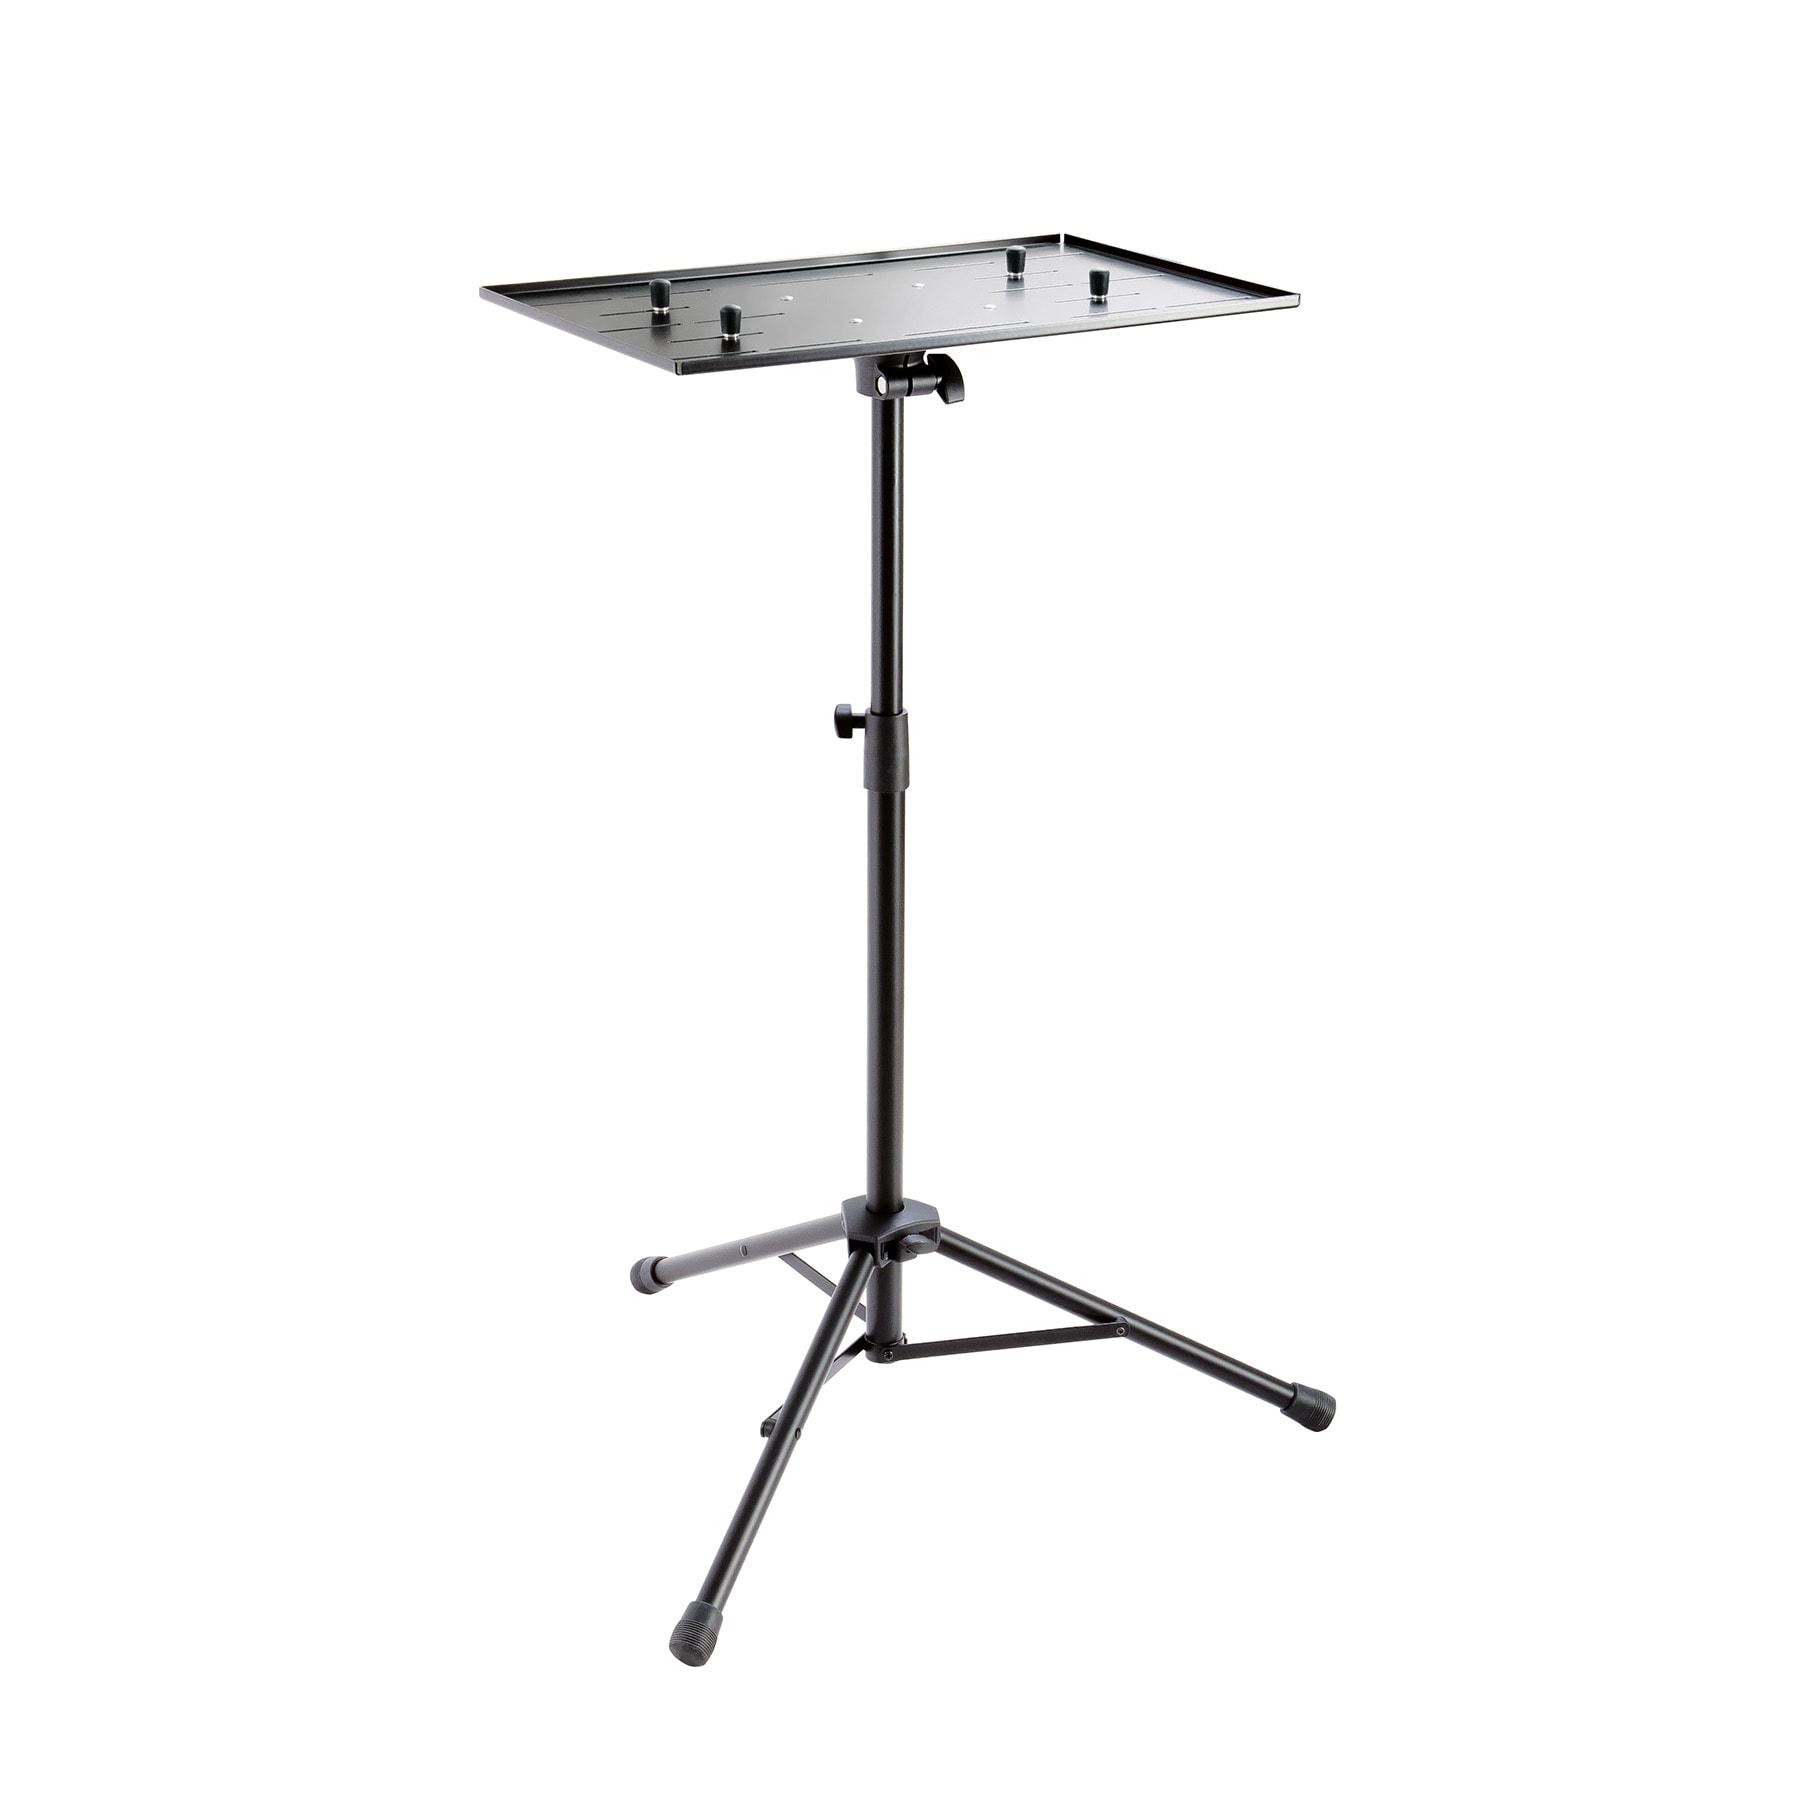 KM12185 - Laptop stand